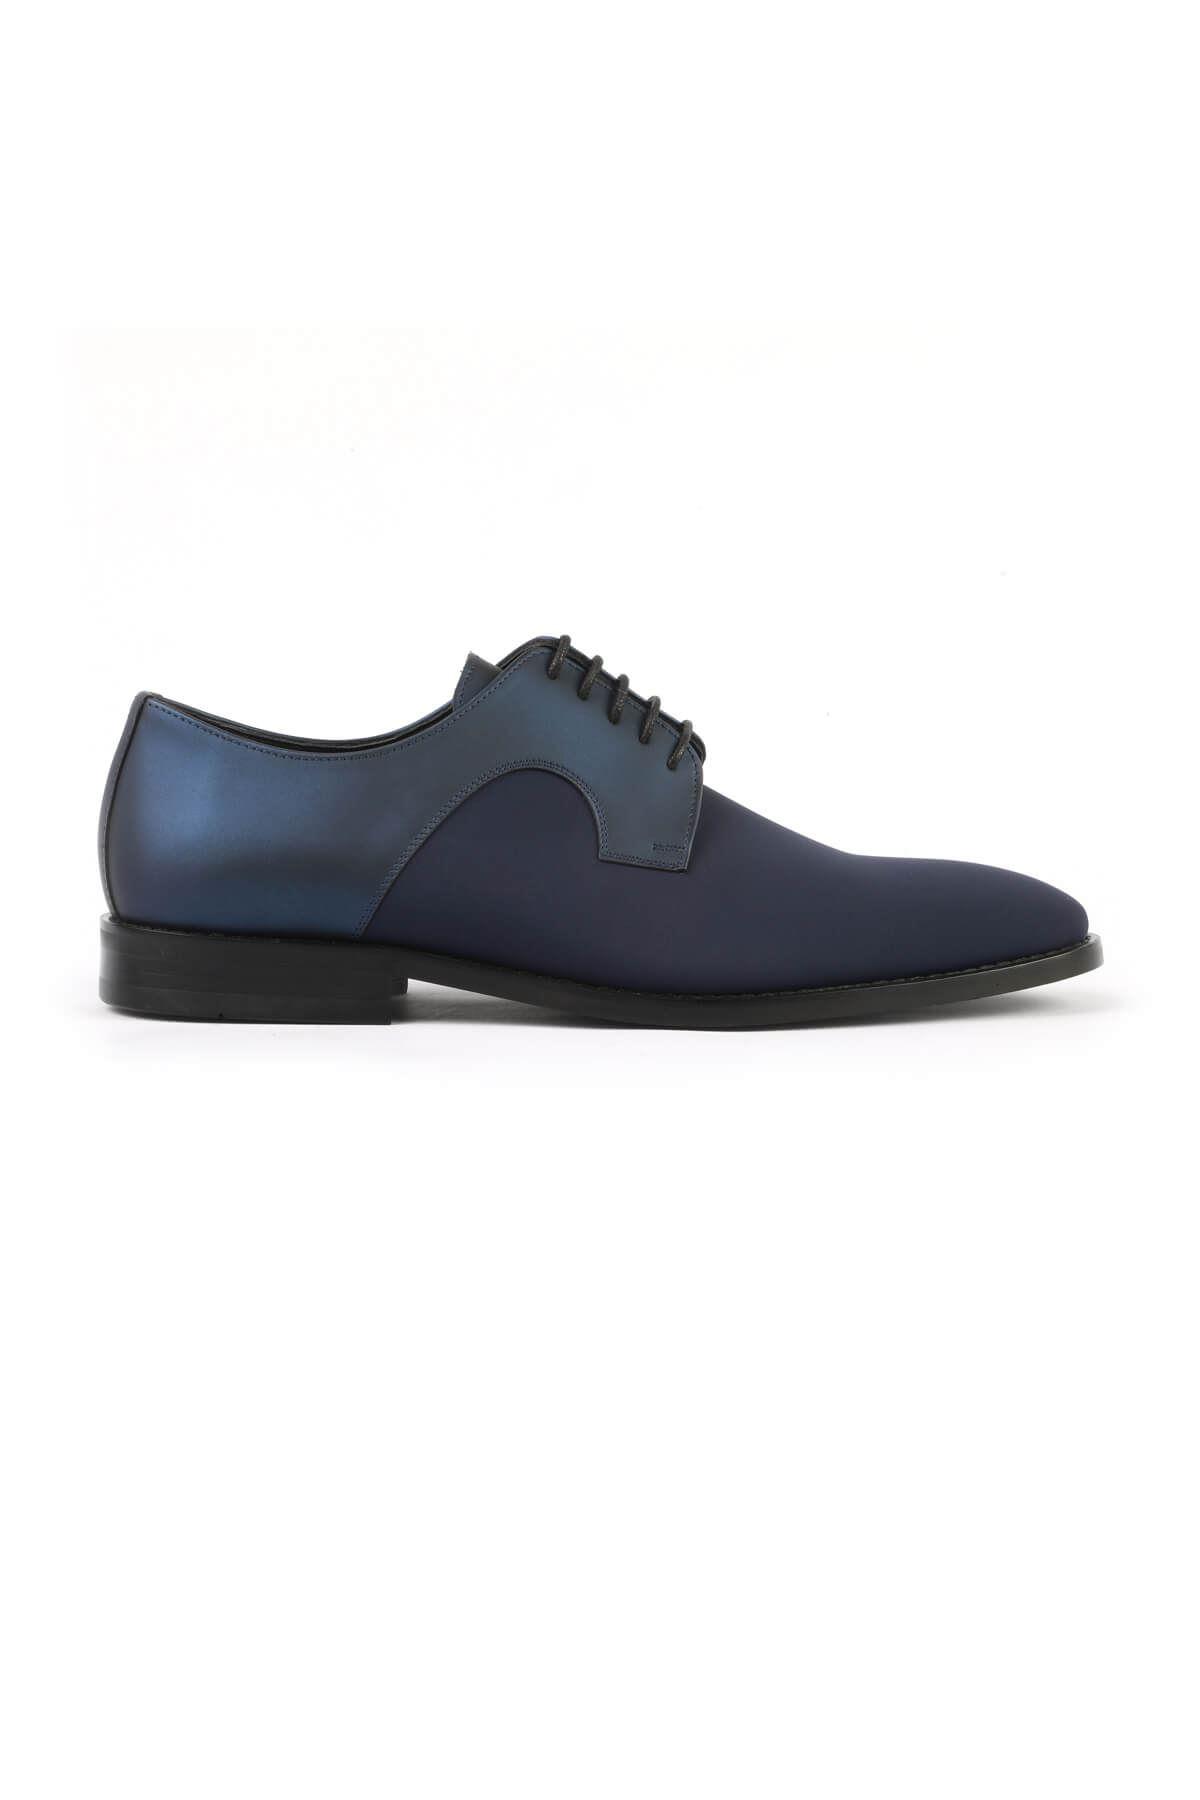 Libero 2727 Navy Blue Classic Shoes